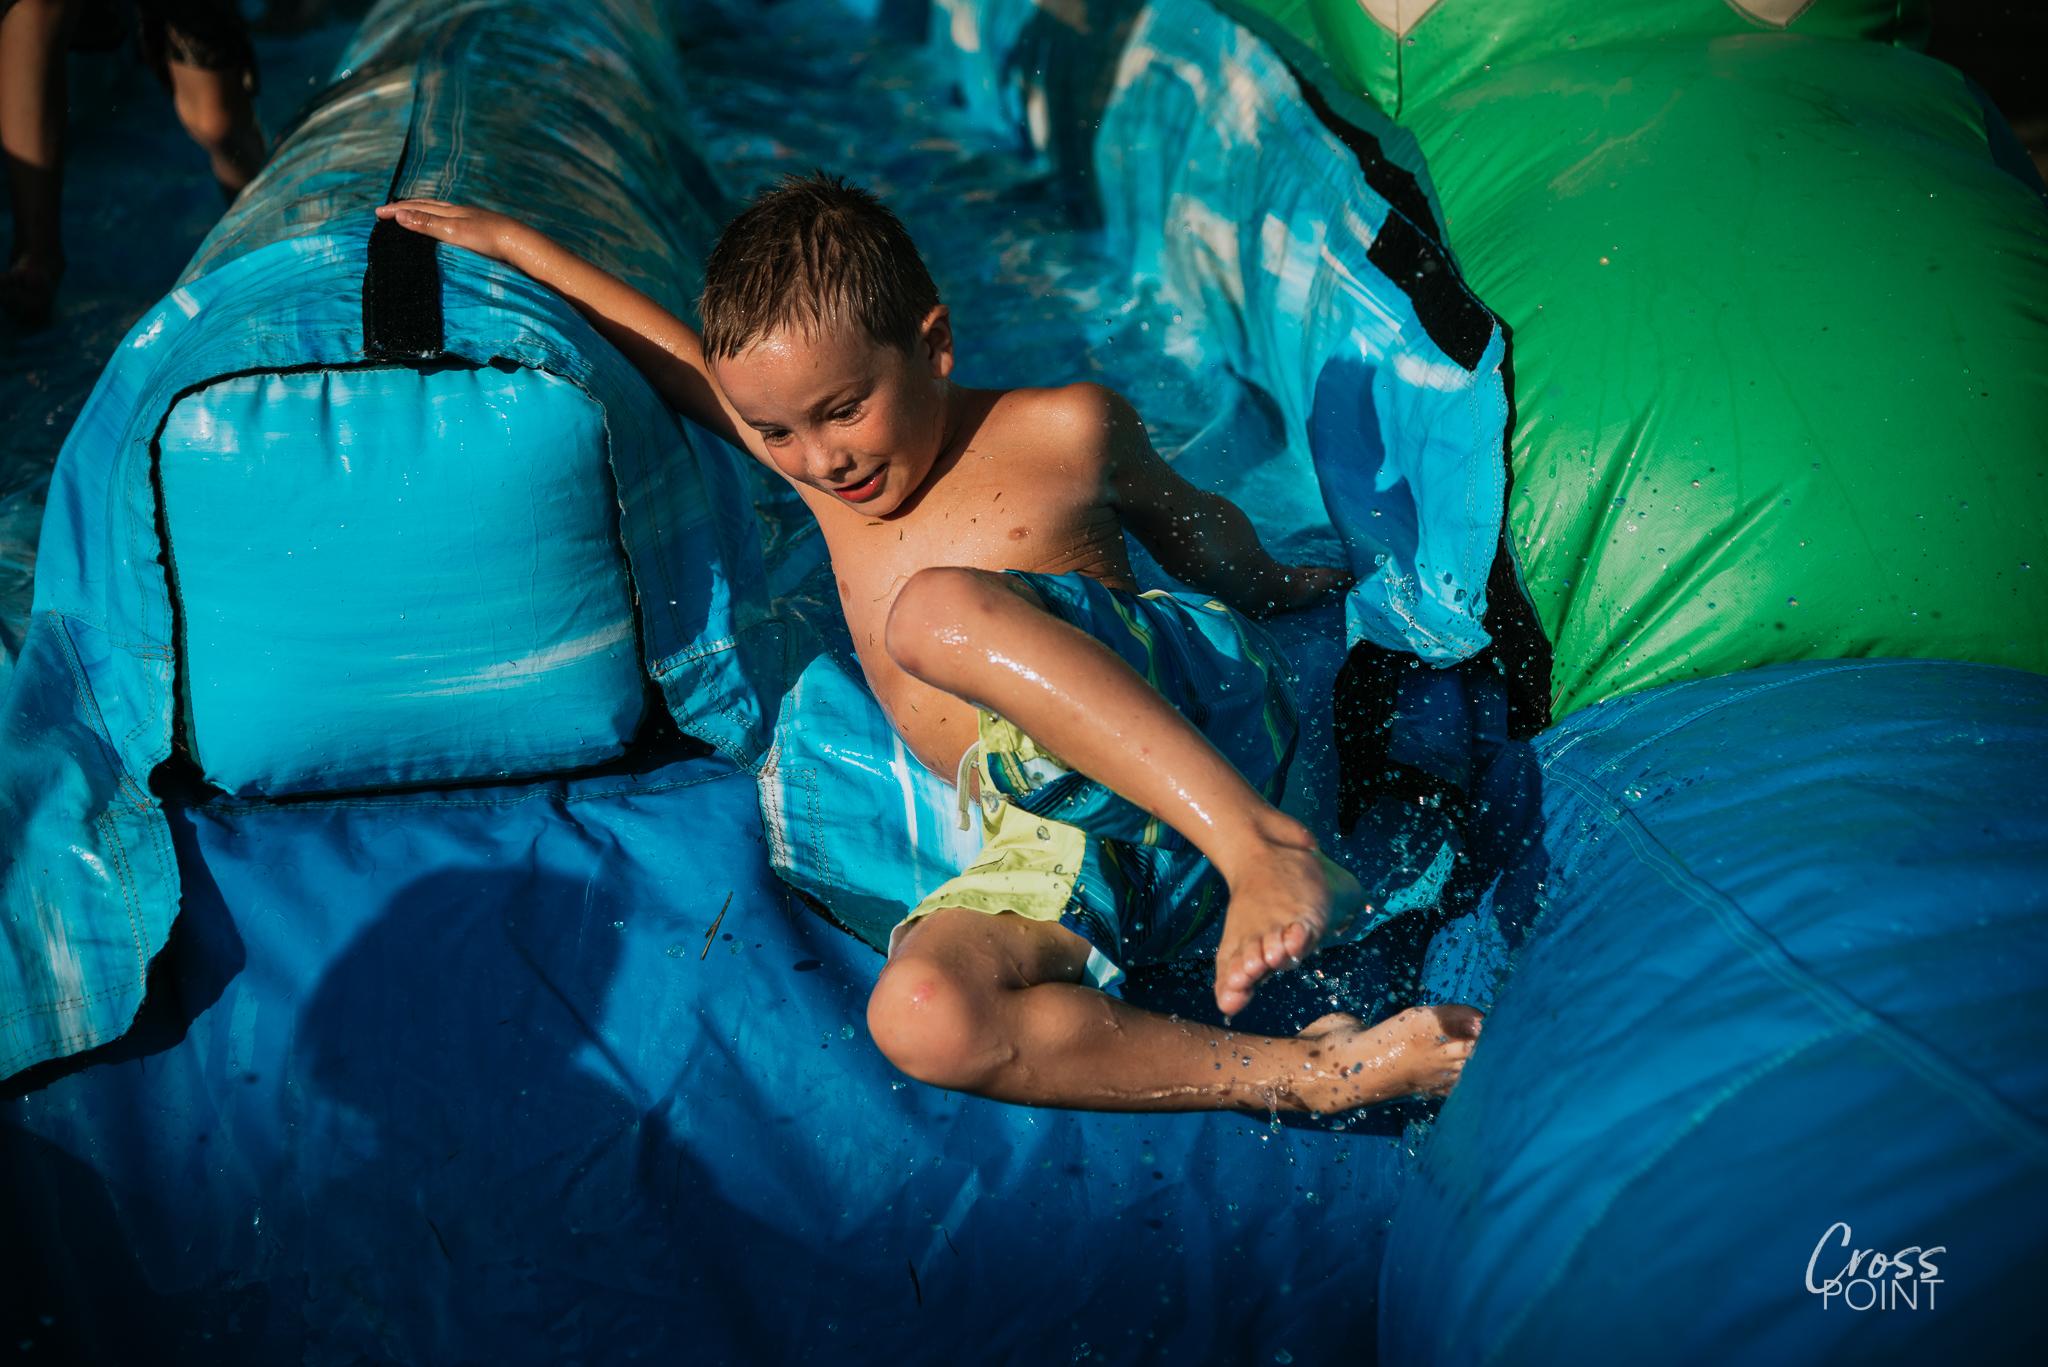 CrossPoint-Water-Famjam-Katy-TX-2018-15.jpg